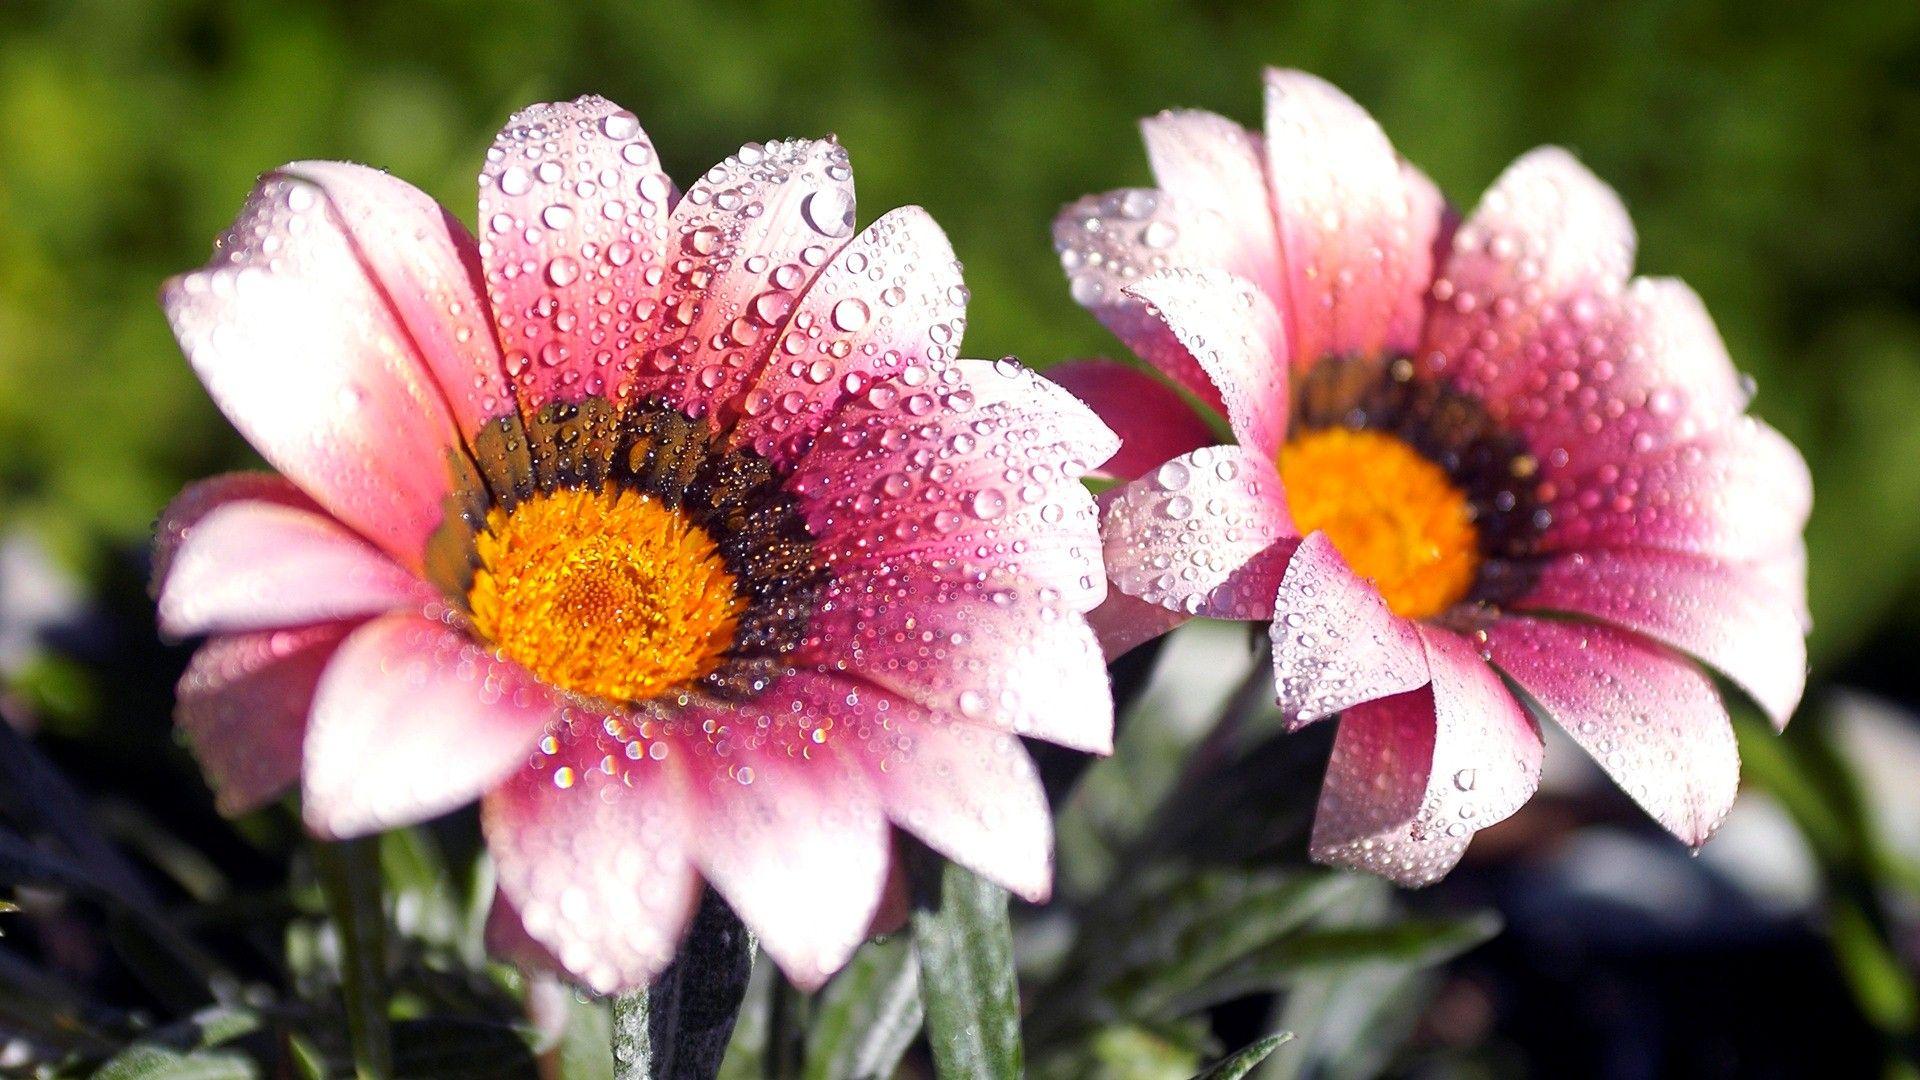 Beautiful Amazing Flower Water Drops Hd Wallpaper